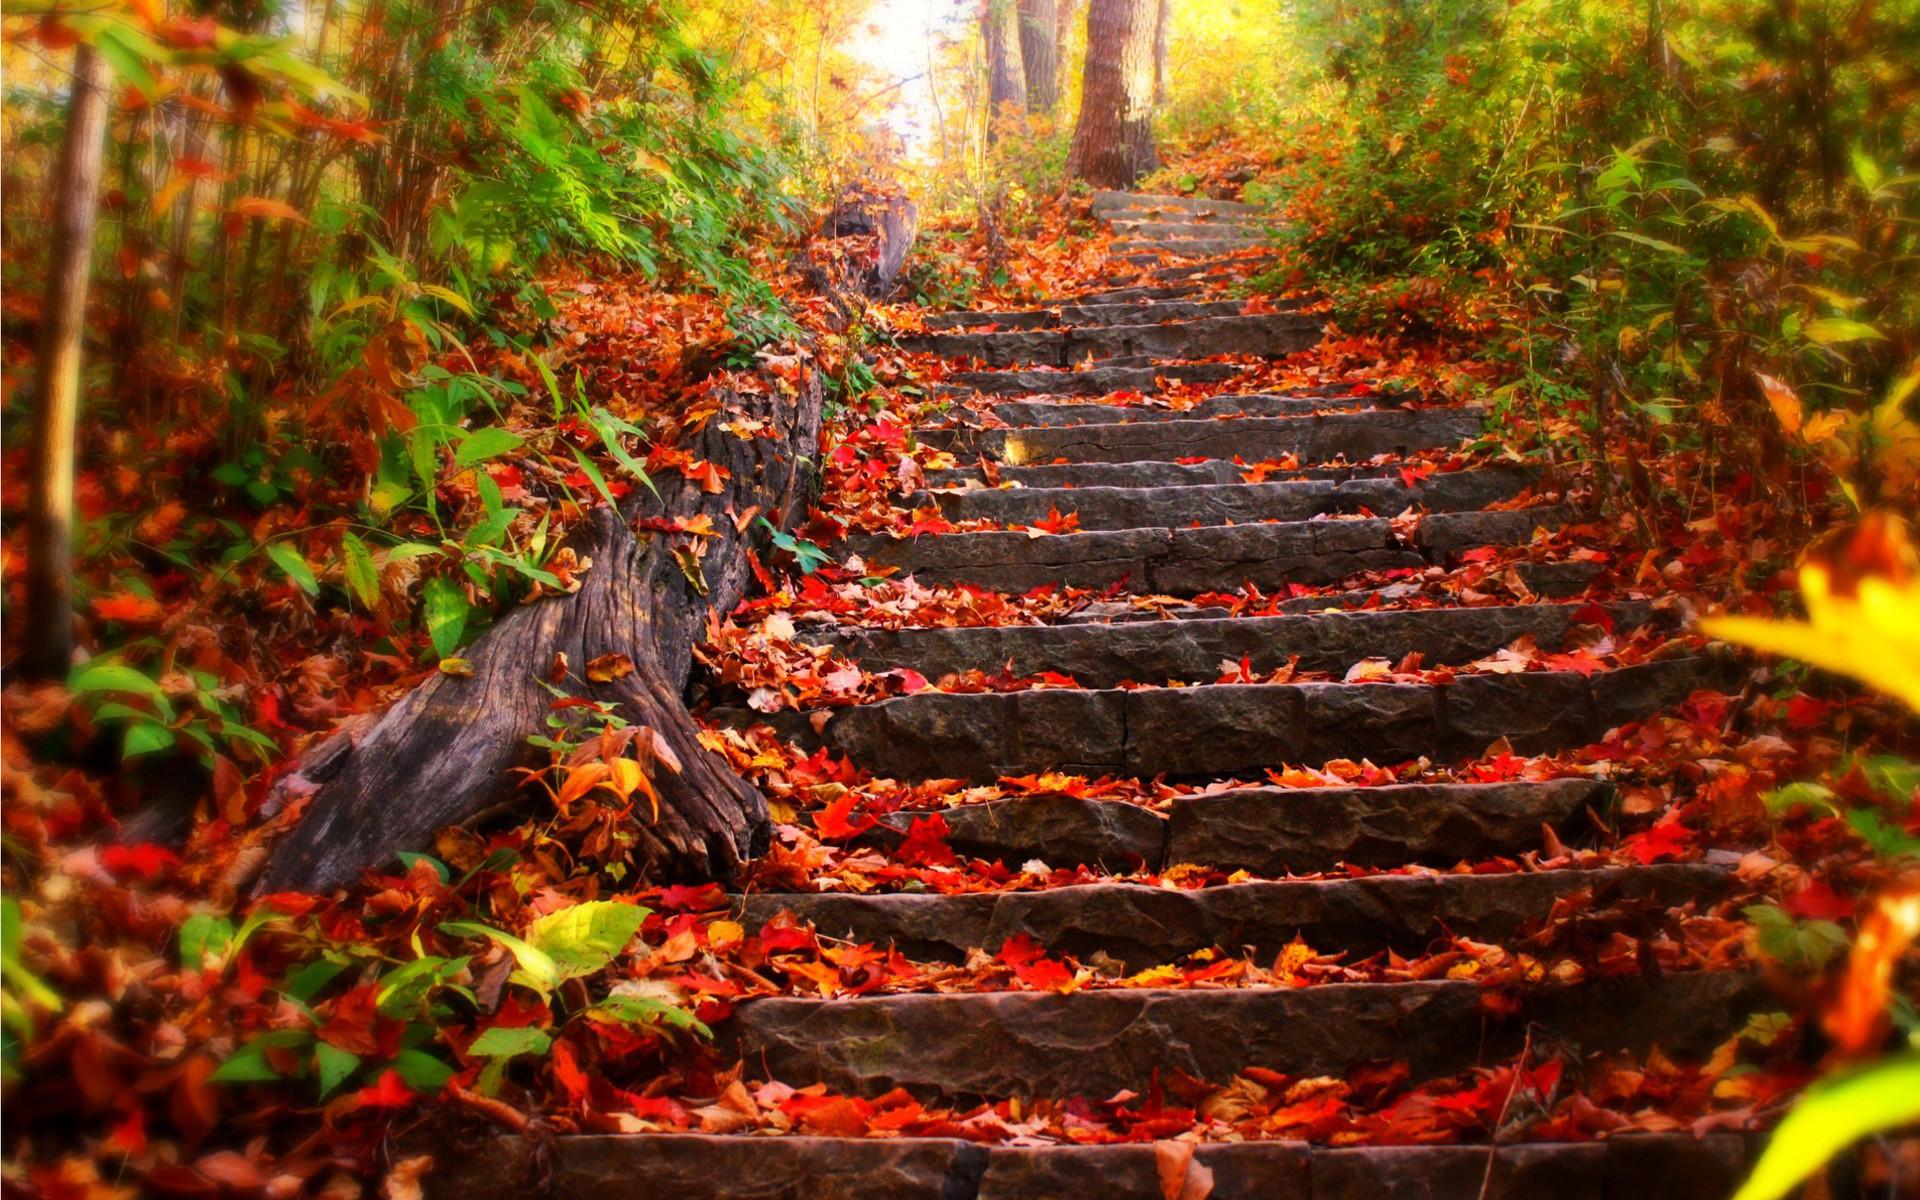 Autumn steps / 1920 x 1200 / Other / Photography | MIRIADNA.COM